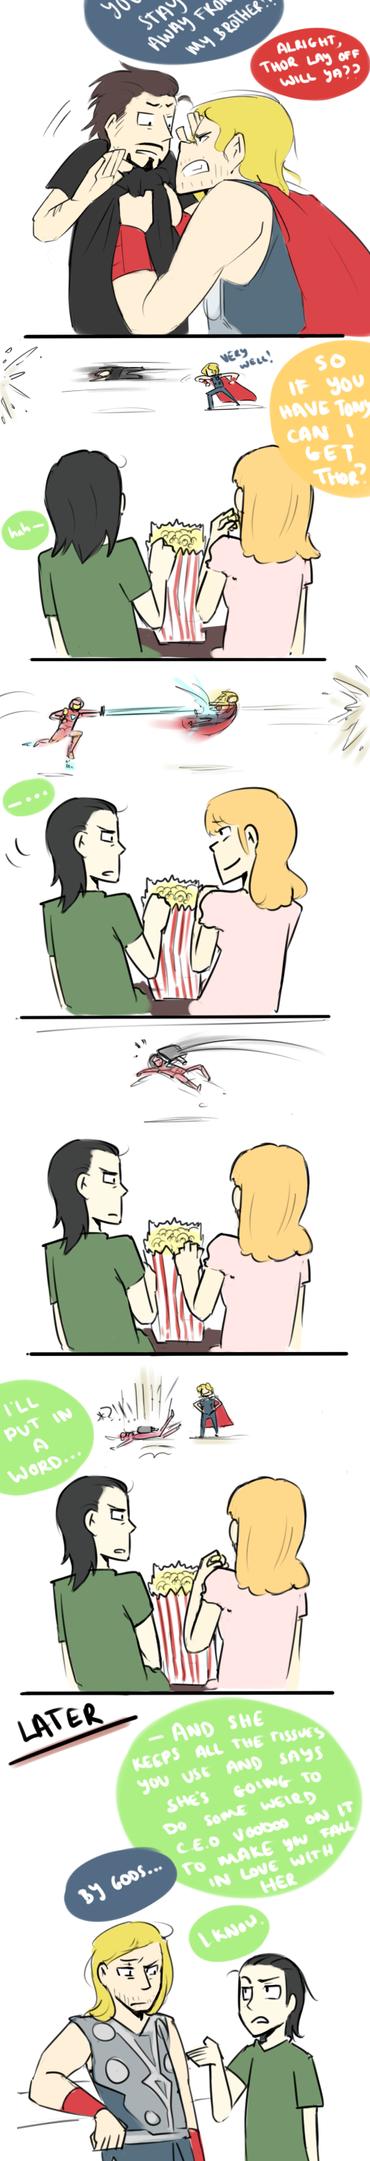 Jealous by blargberries